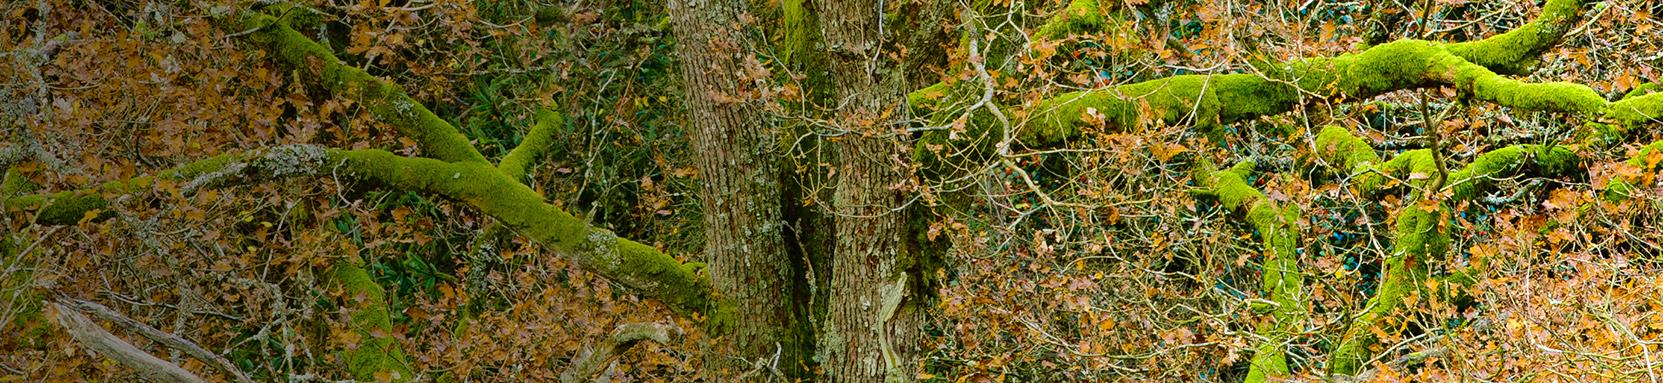 Zomereik, bomenbeheer